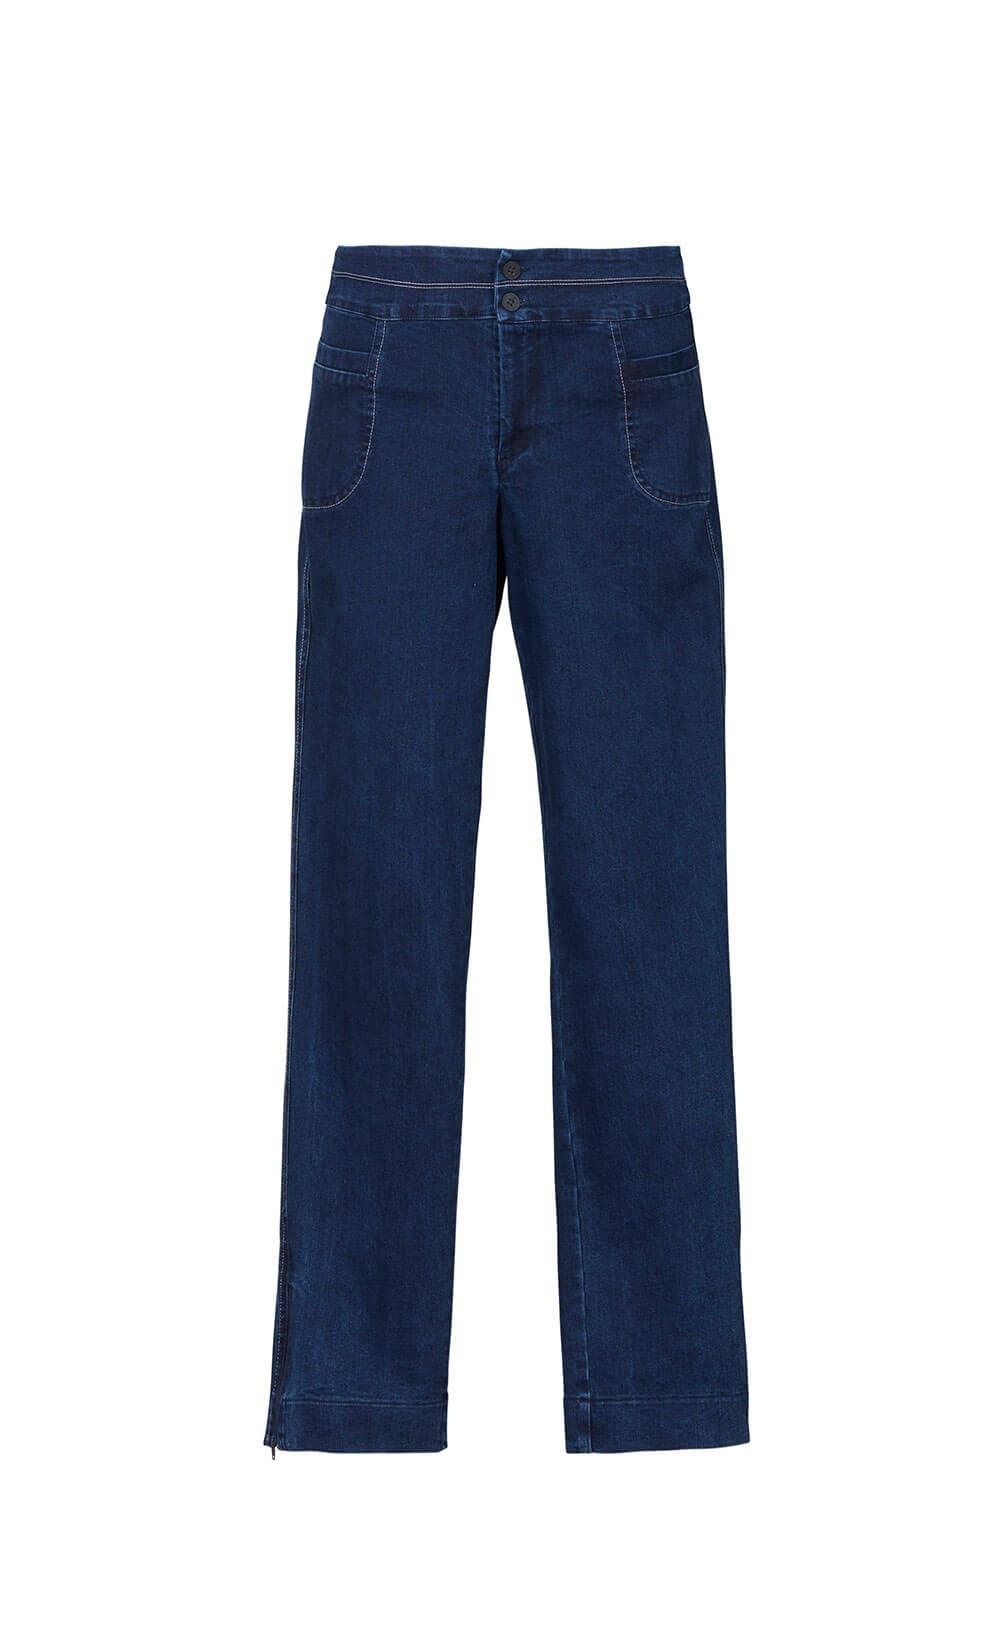 Tiromerro Jeans